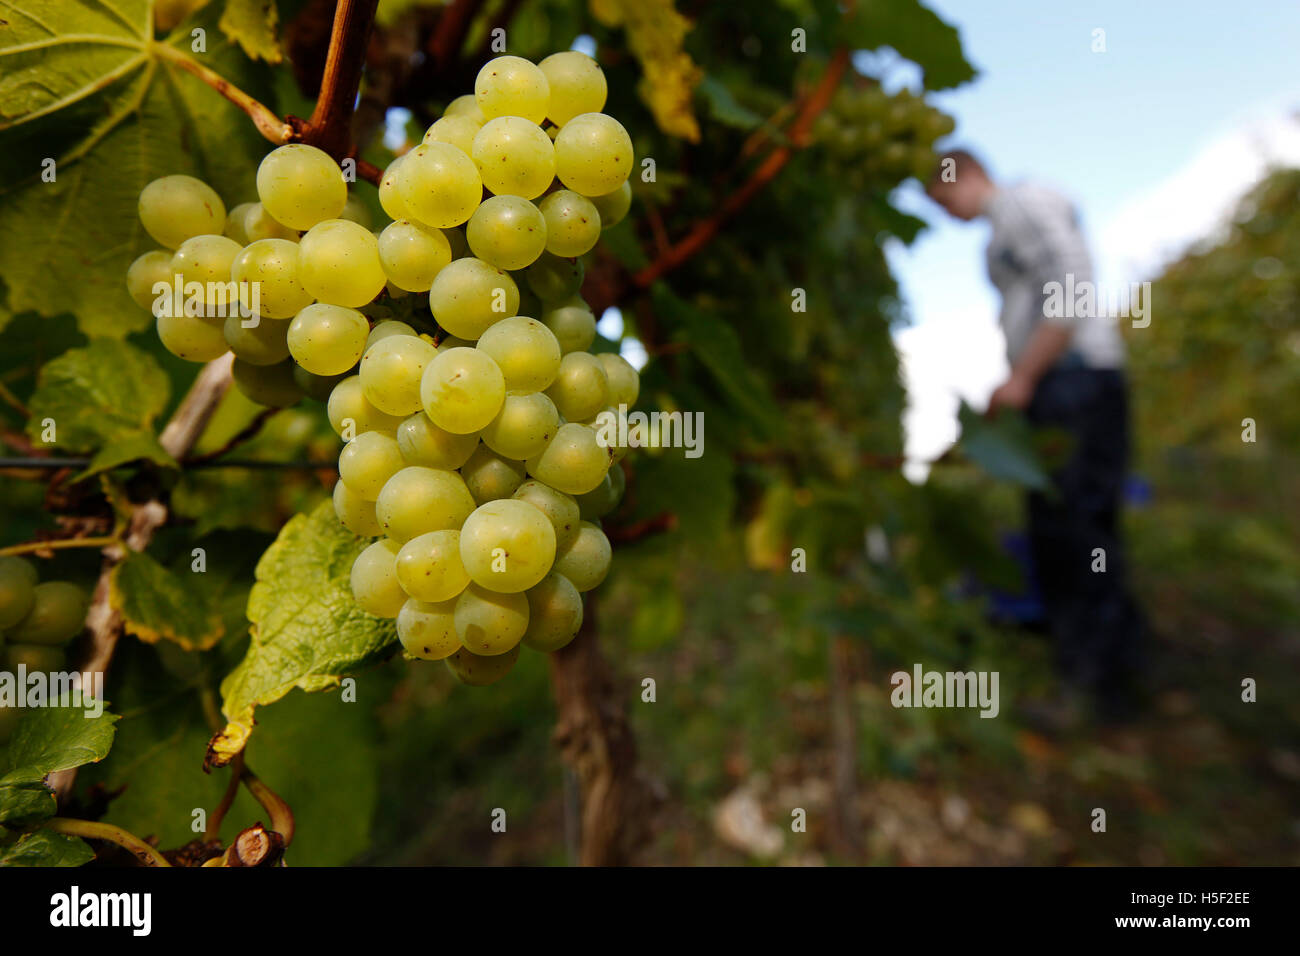 Hambledon Vineyard, Hampshire, UK. 19th October, 2016. A labourer works among the vines harvesting chardonnay grapes Stock Photo